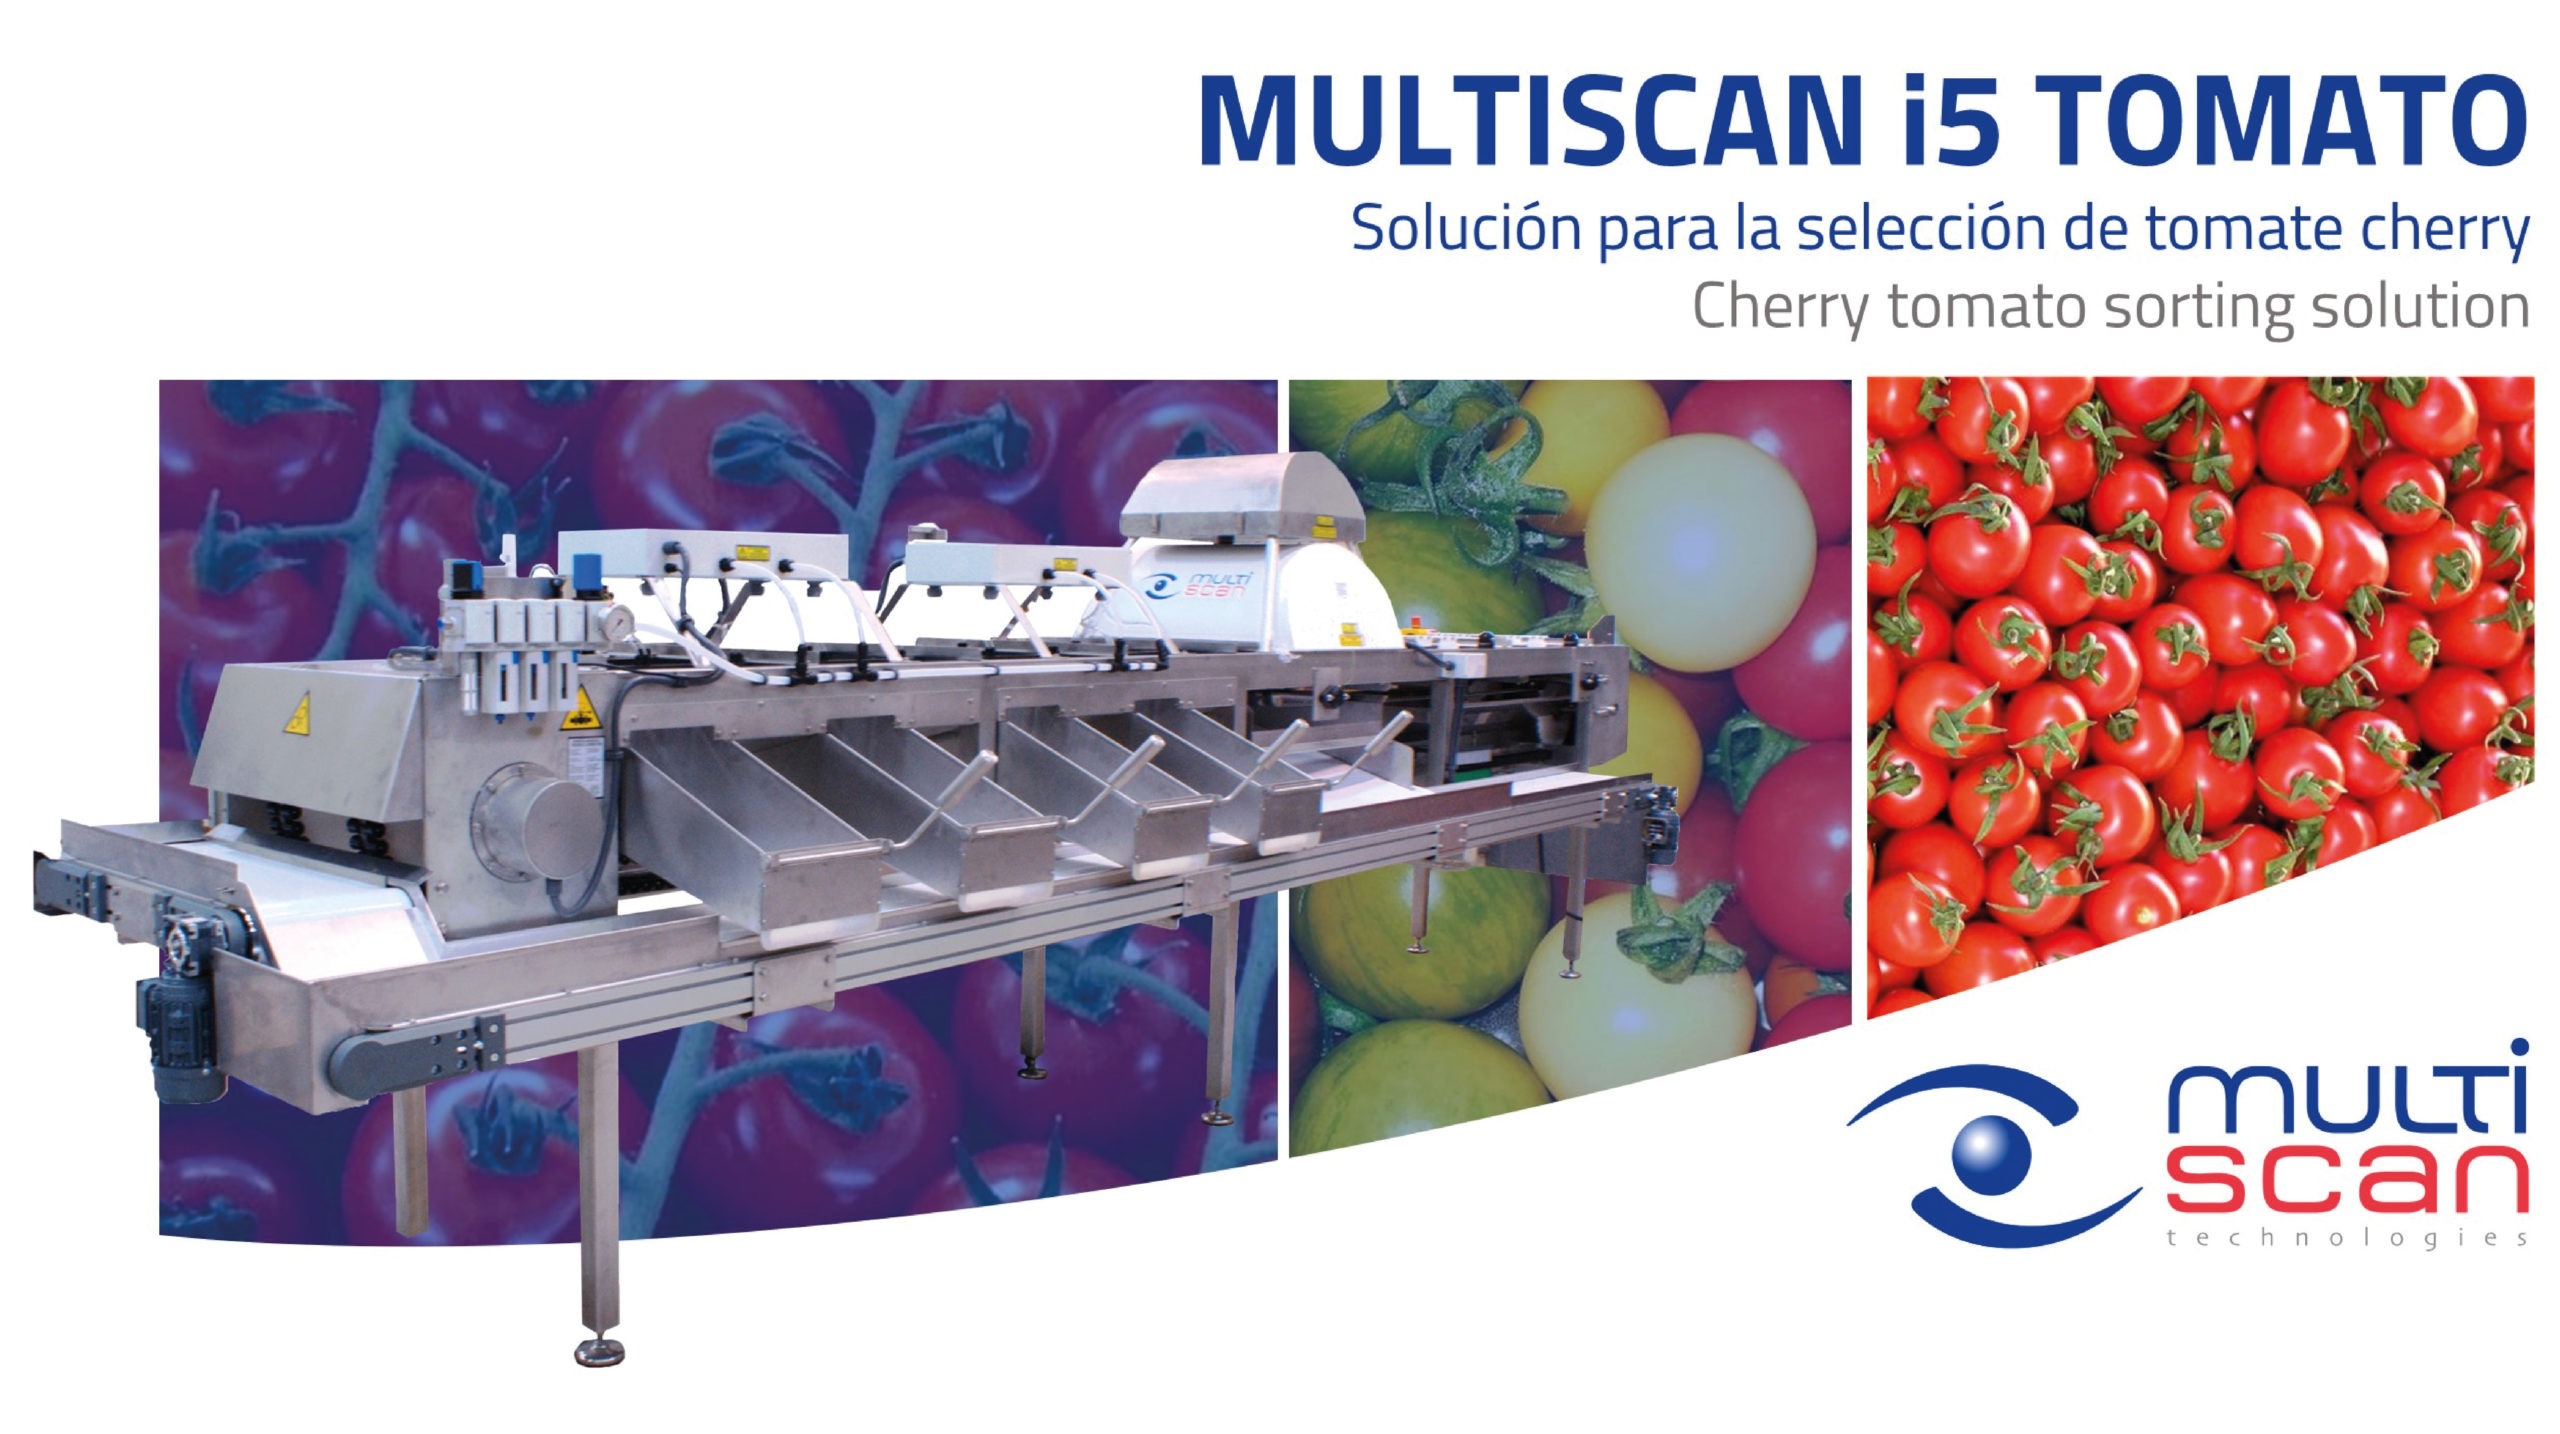 Multiscan i5 Tomato, cherry tomato sorting solution